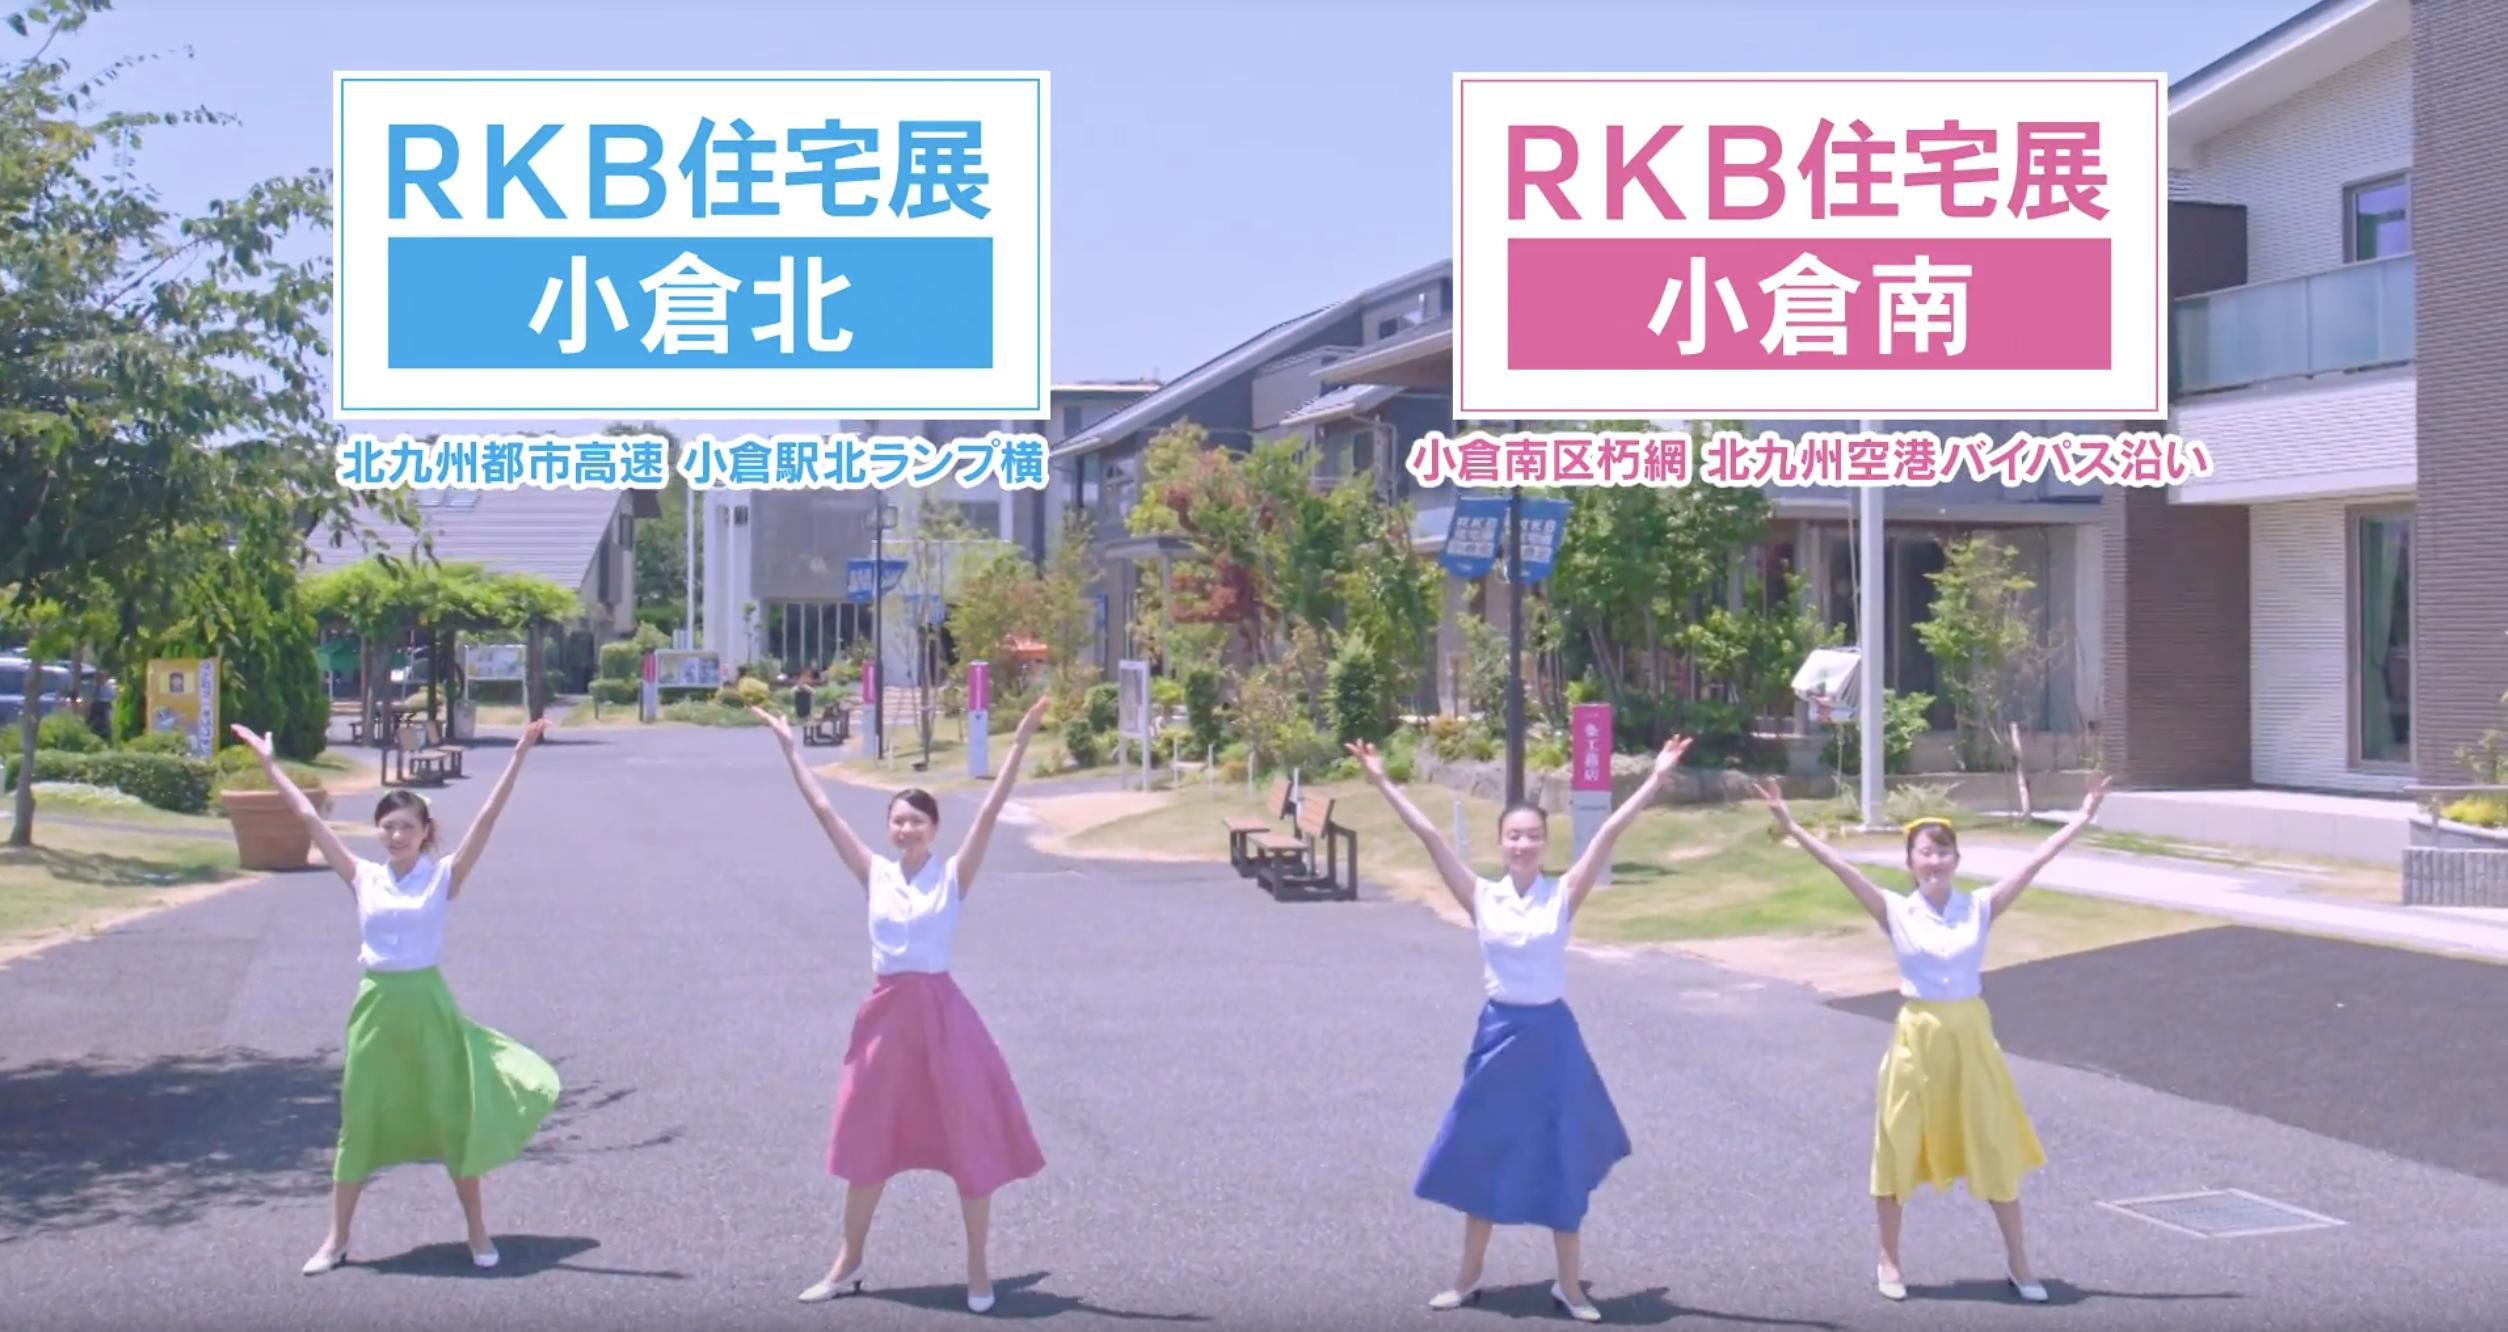 RKB住宅展 TVCM